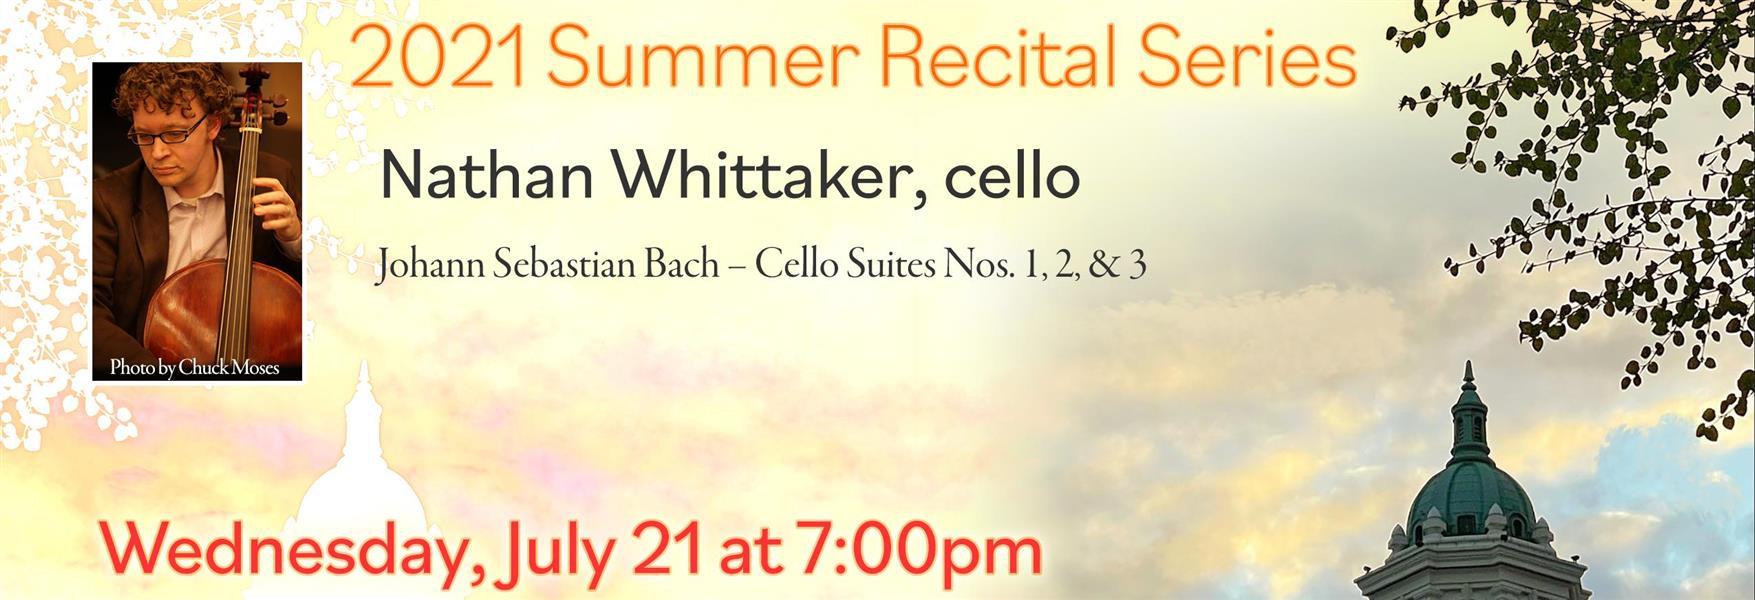 ab139fe8-505e-4849-be10-f54614828afb_2021-summer-recital-banner-Nathan-Whittaker-FB.jpg